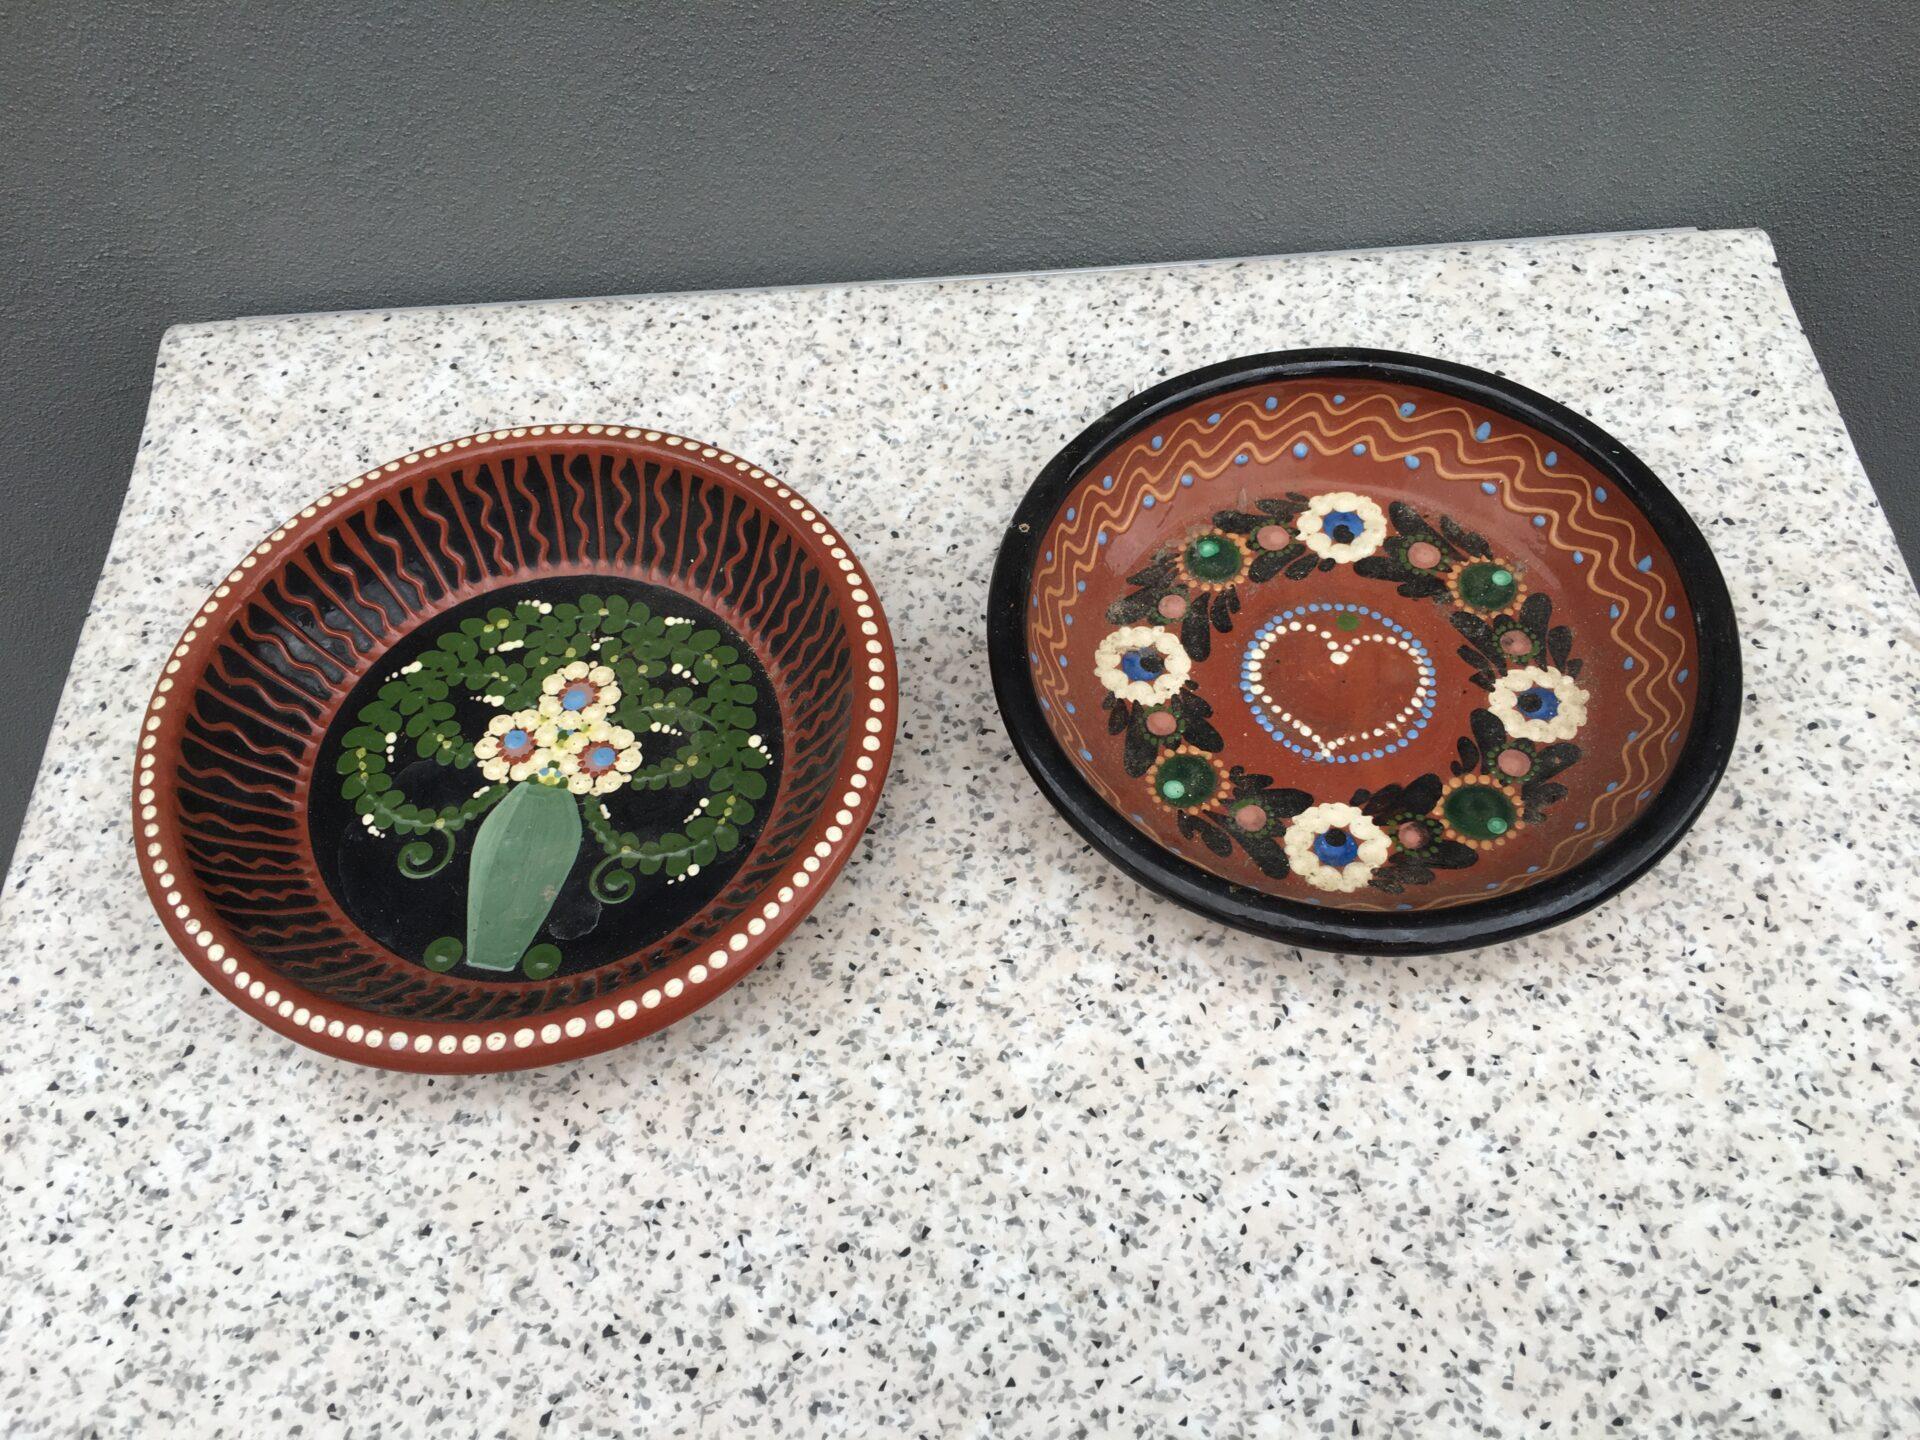 Mering keramik (utydeligt stemplet) bordskåle, h=5,5 cm, d= 25 cm, pris 500kr